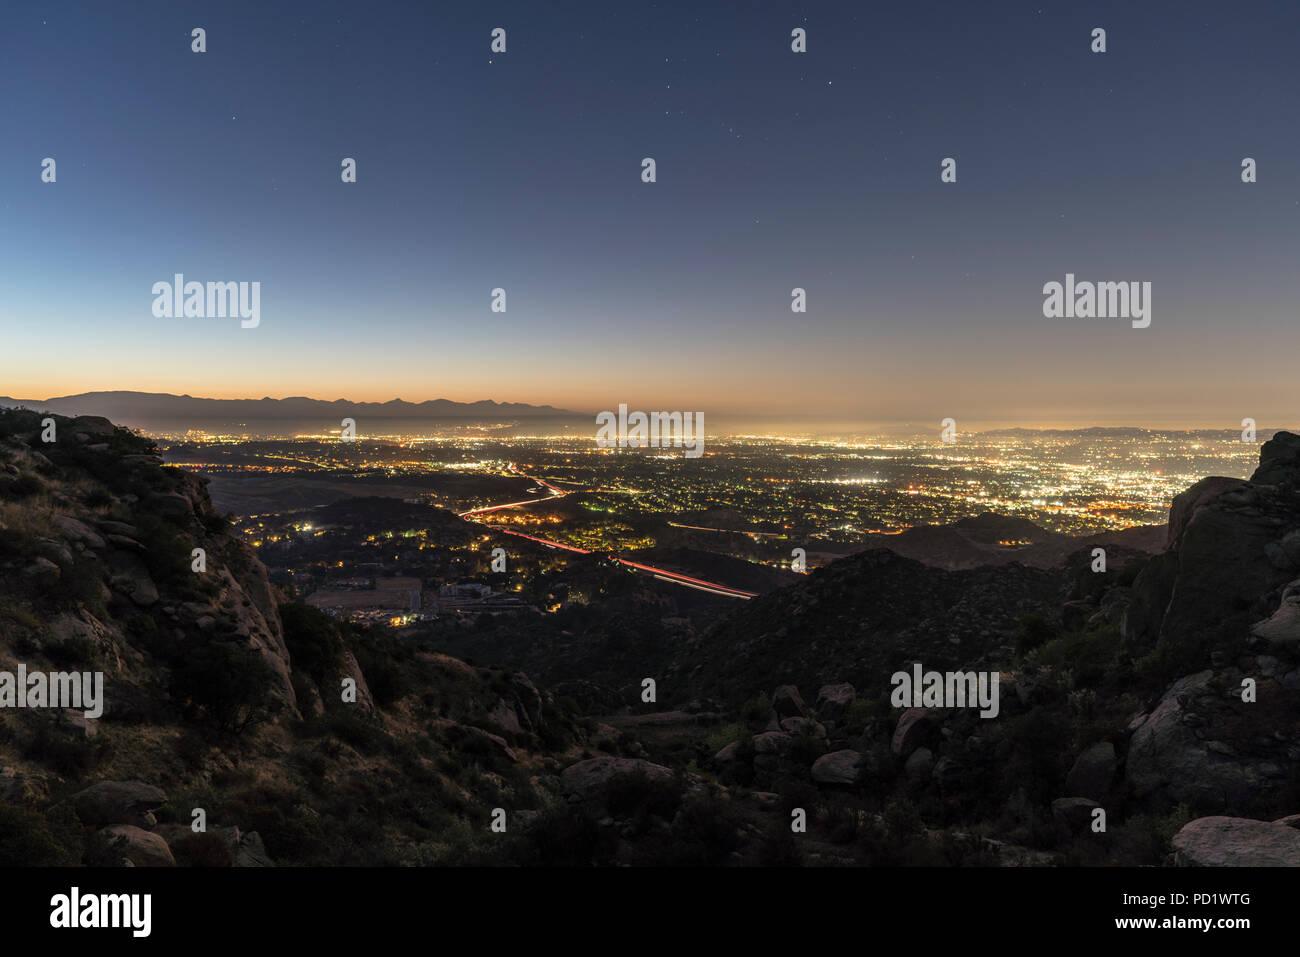 Los Angeles California Predawn San Fernando Valley View Shot From